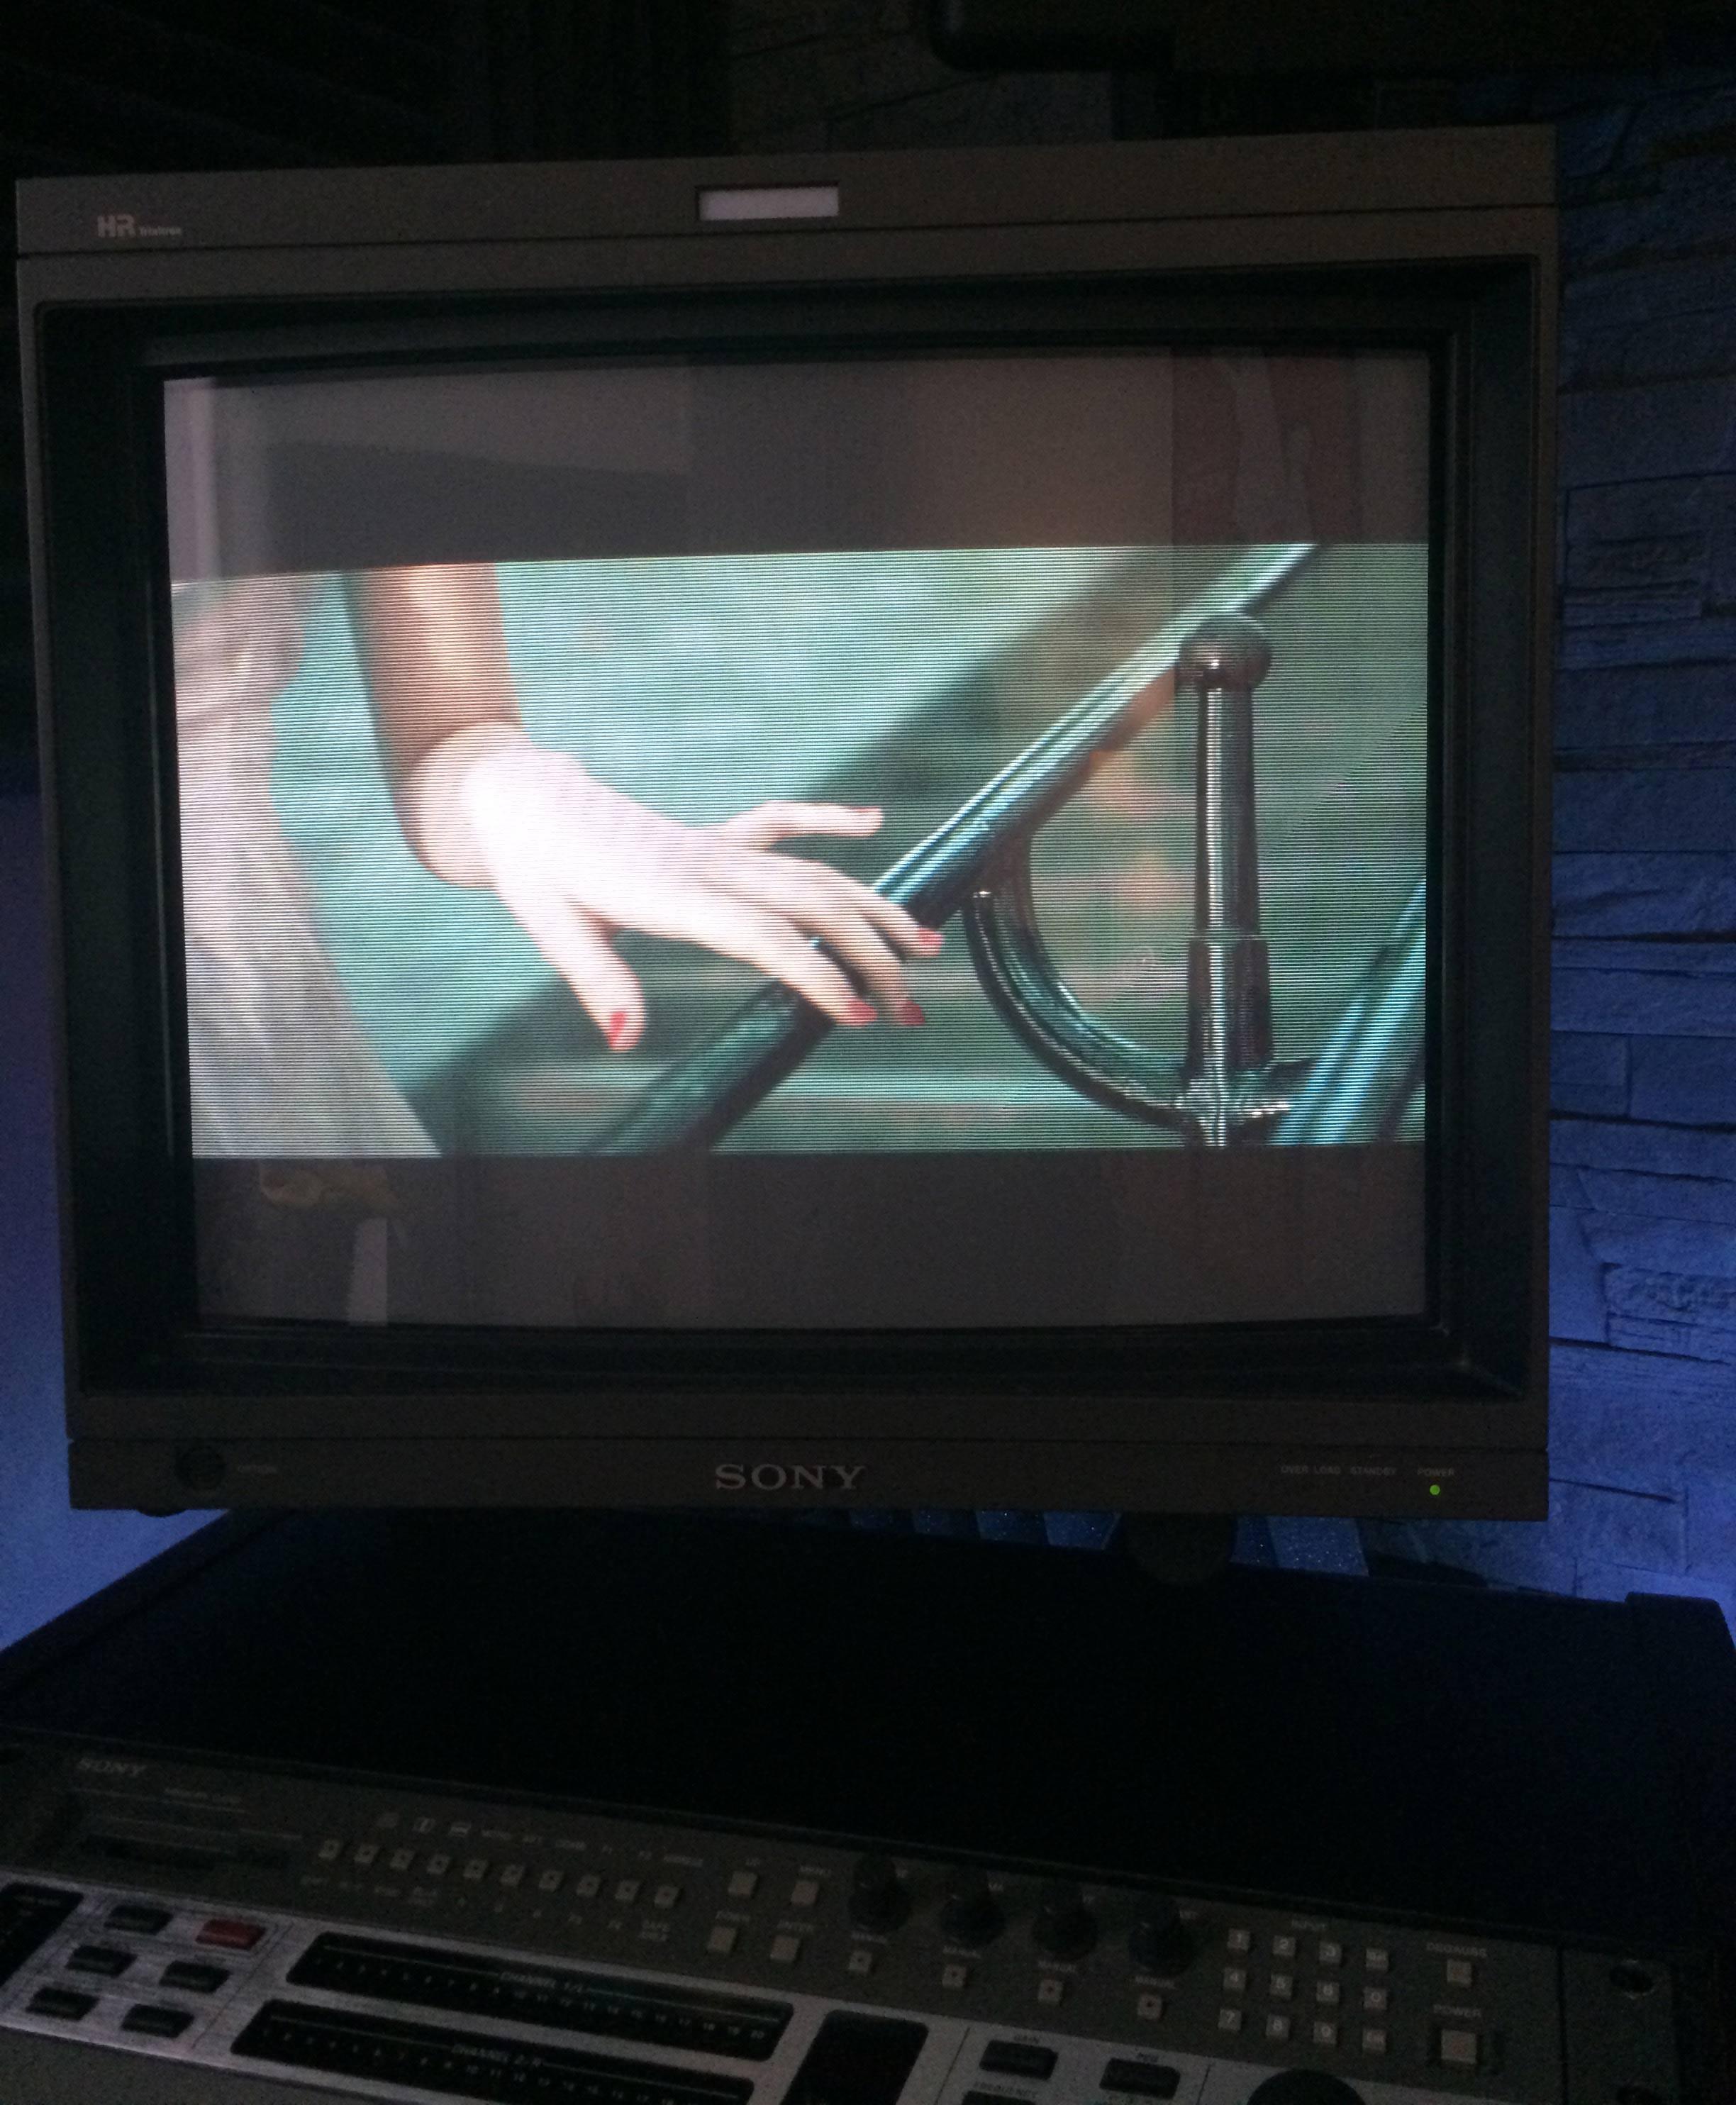 Annonce occasions vends moniteur broadcast sony crt 20 for Moniteur montage video